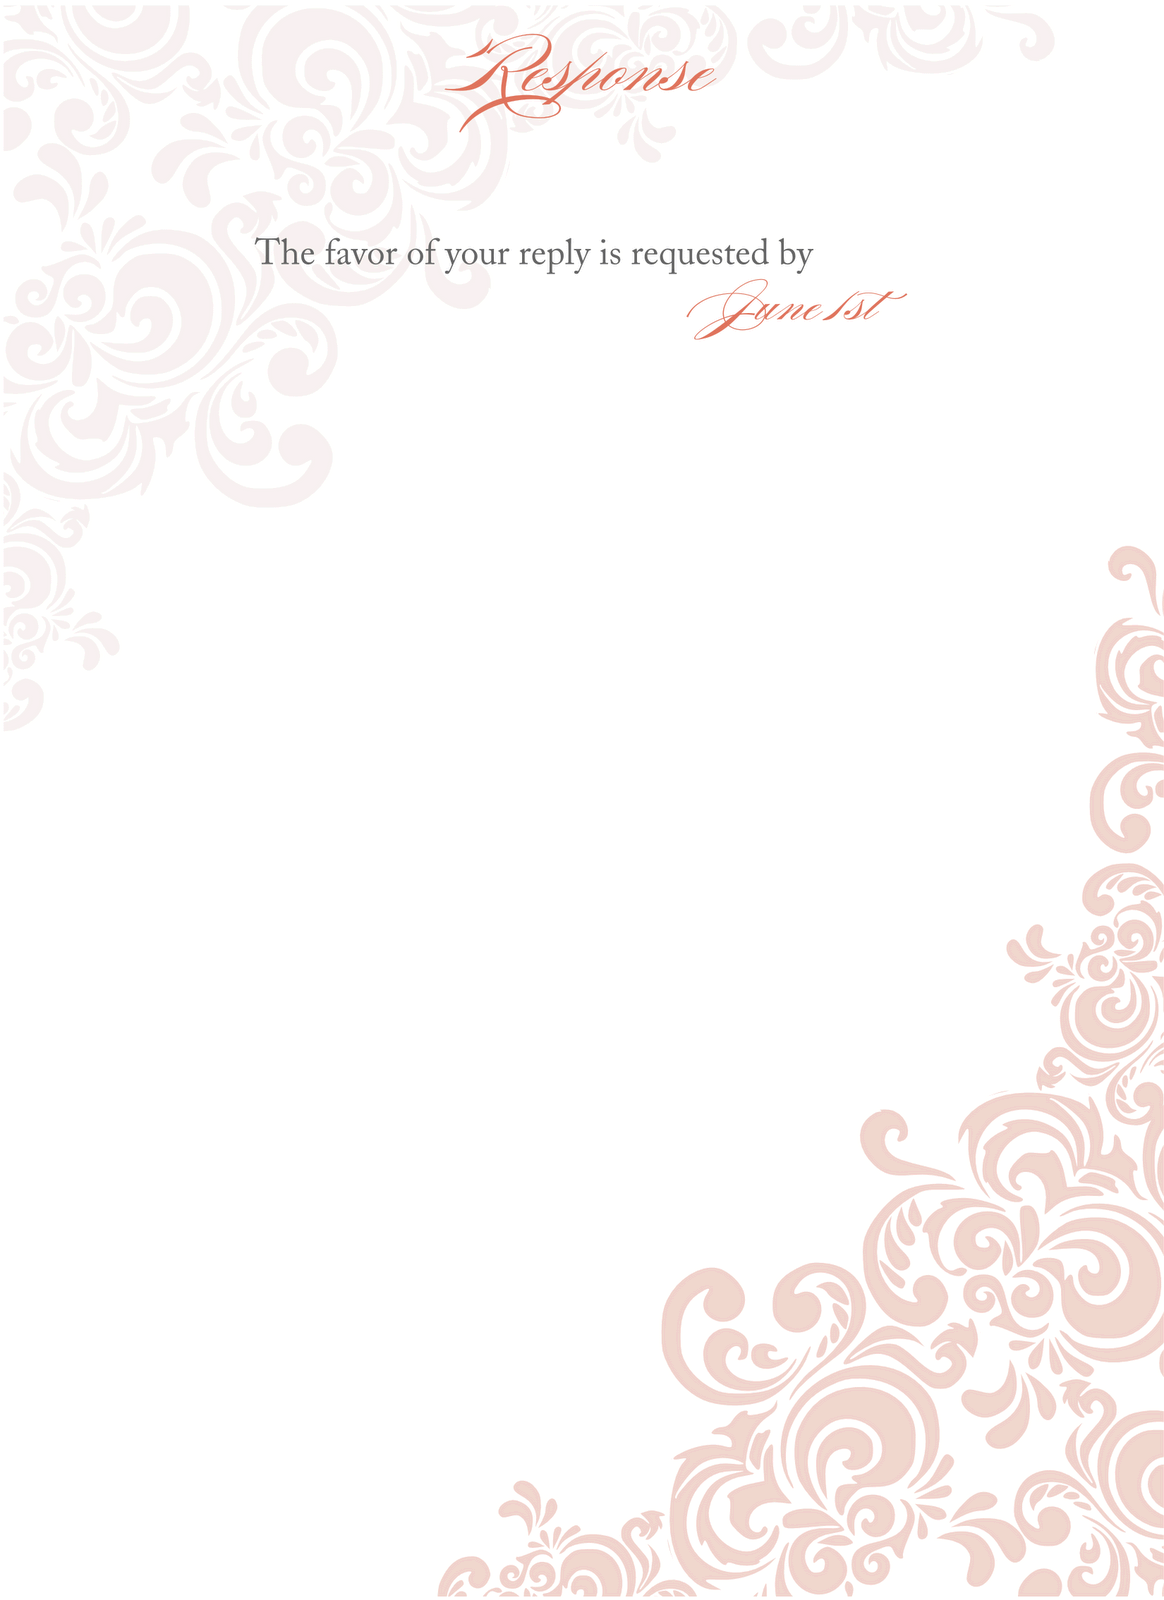 blank wedding invitation cards templates wedding photo templates invitation to inspire